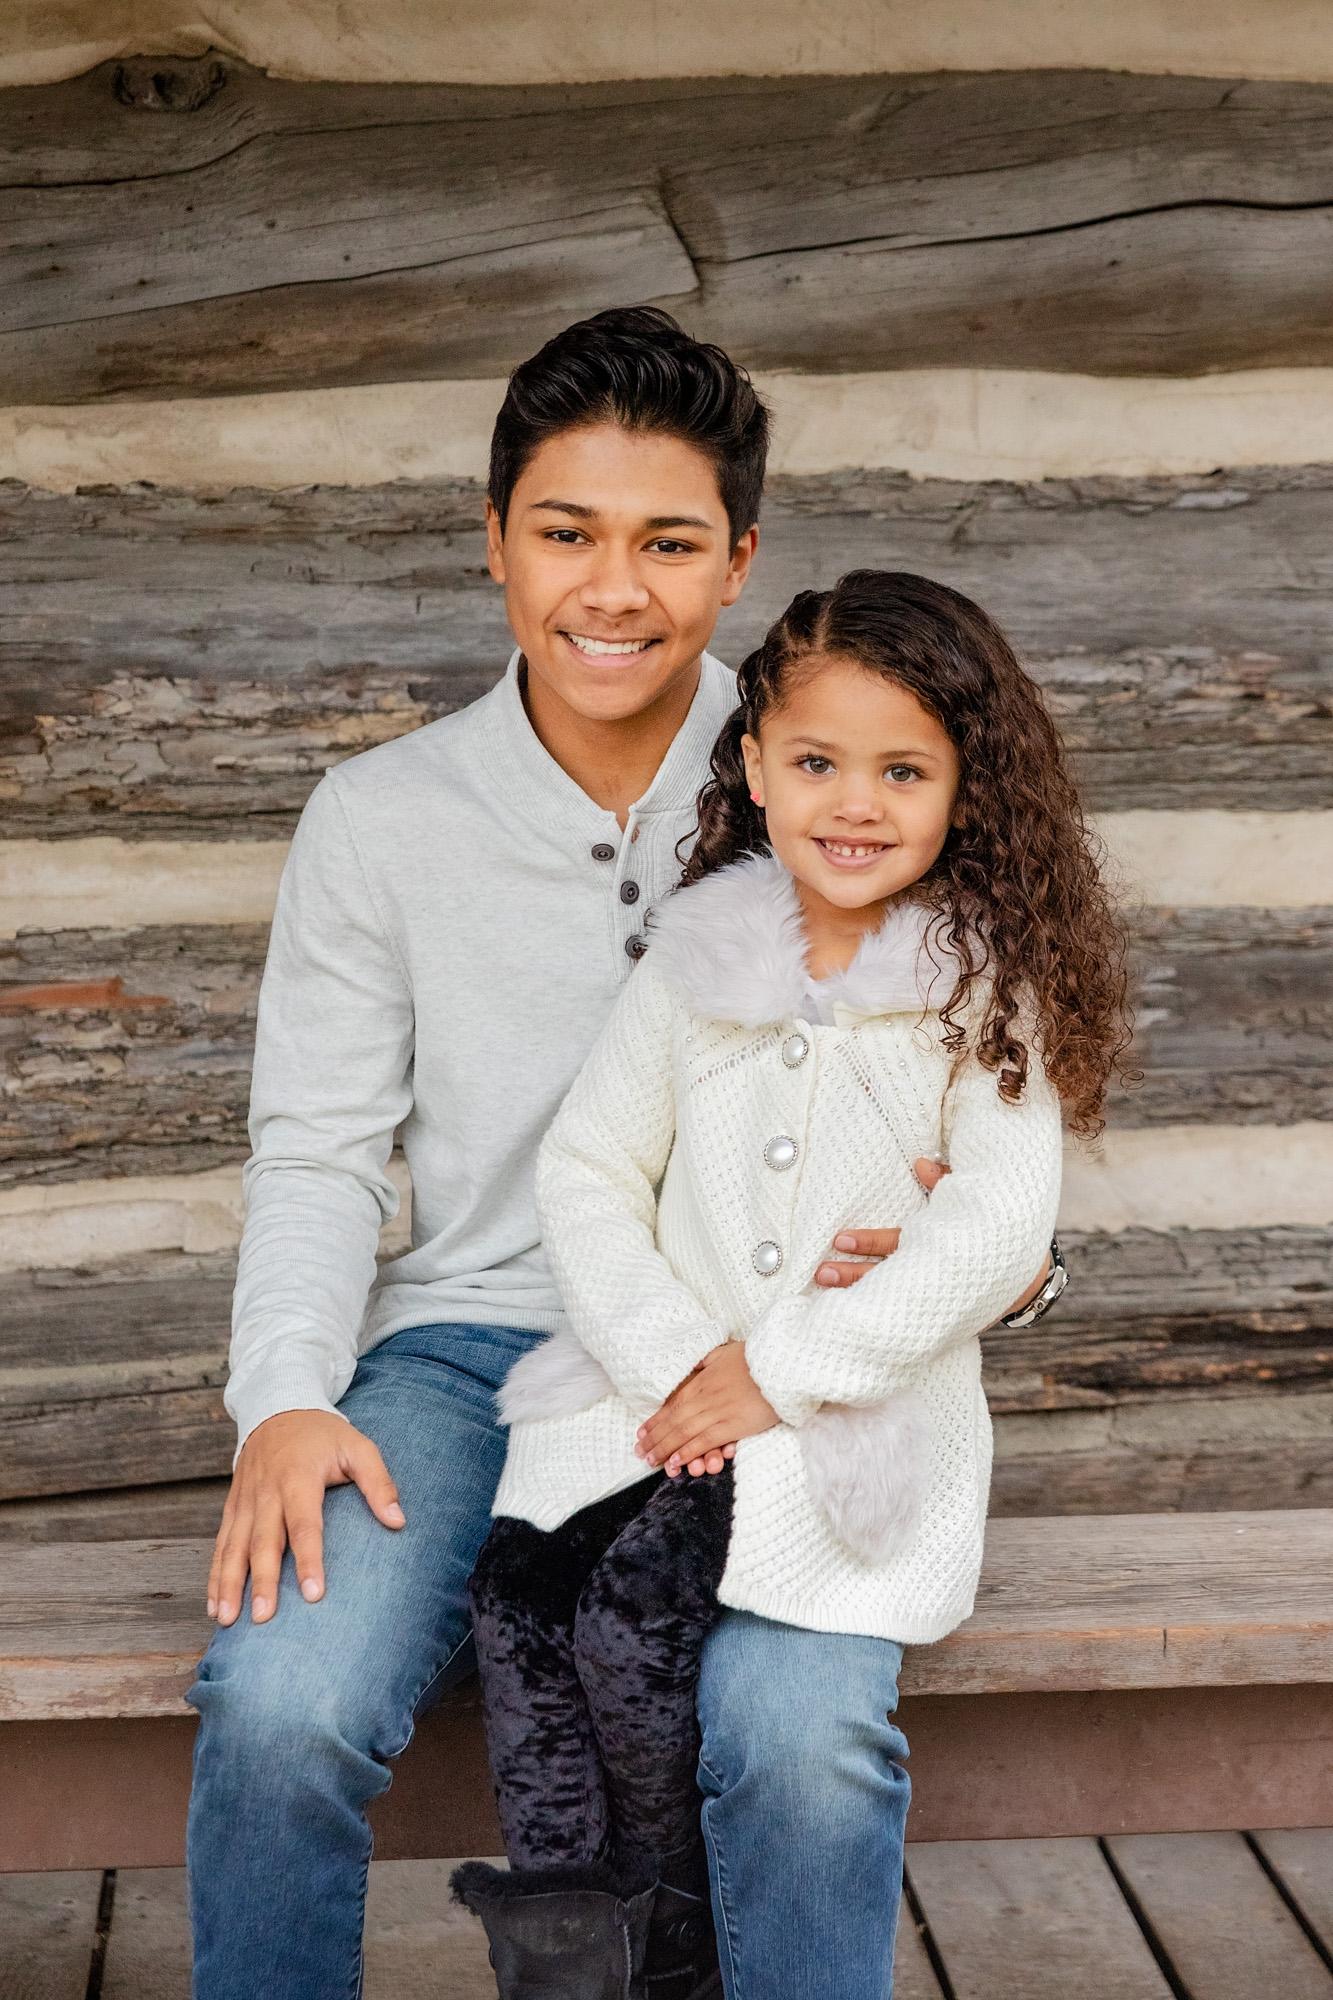 FamilyPortraits_2018-07.jpg